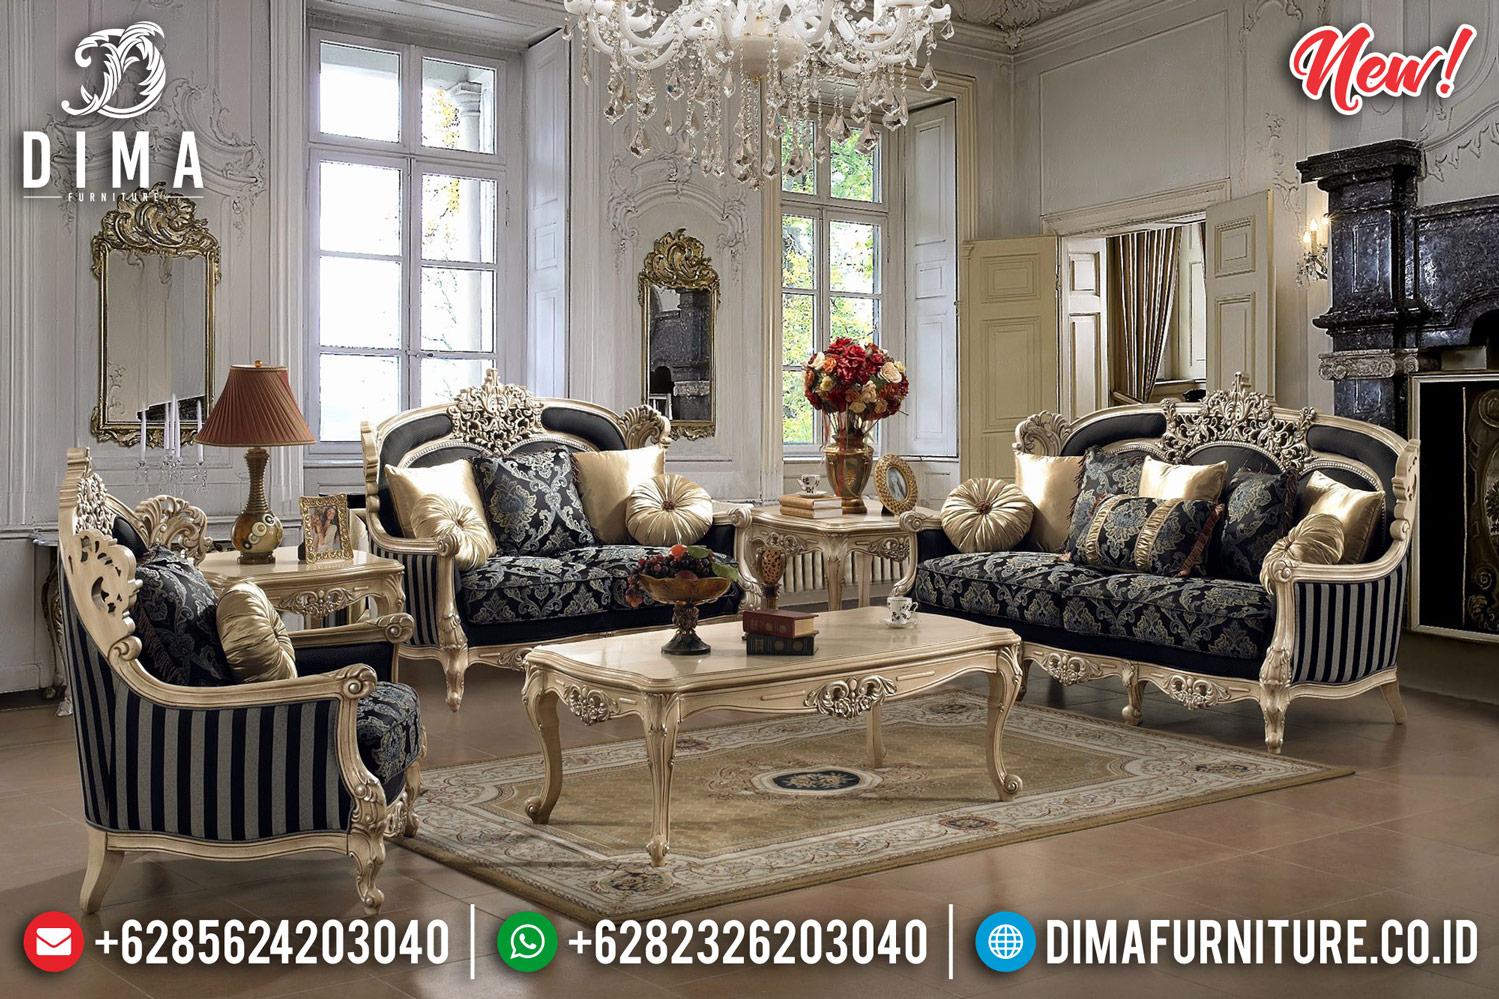 Lexi Style Sofa Tamu Jepara Ukiran Mewah Luxury Royals Classic New Design TTJ-0807